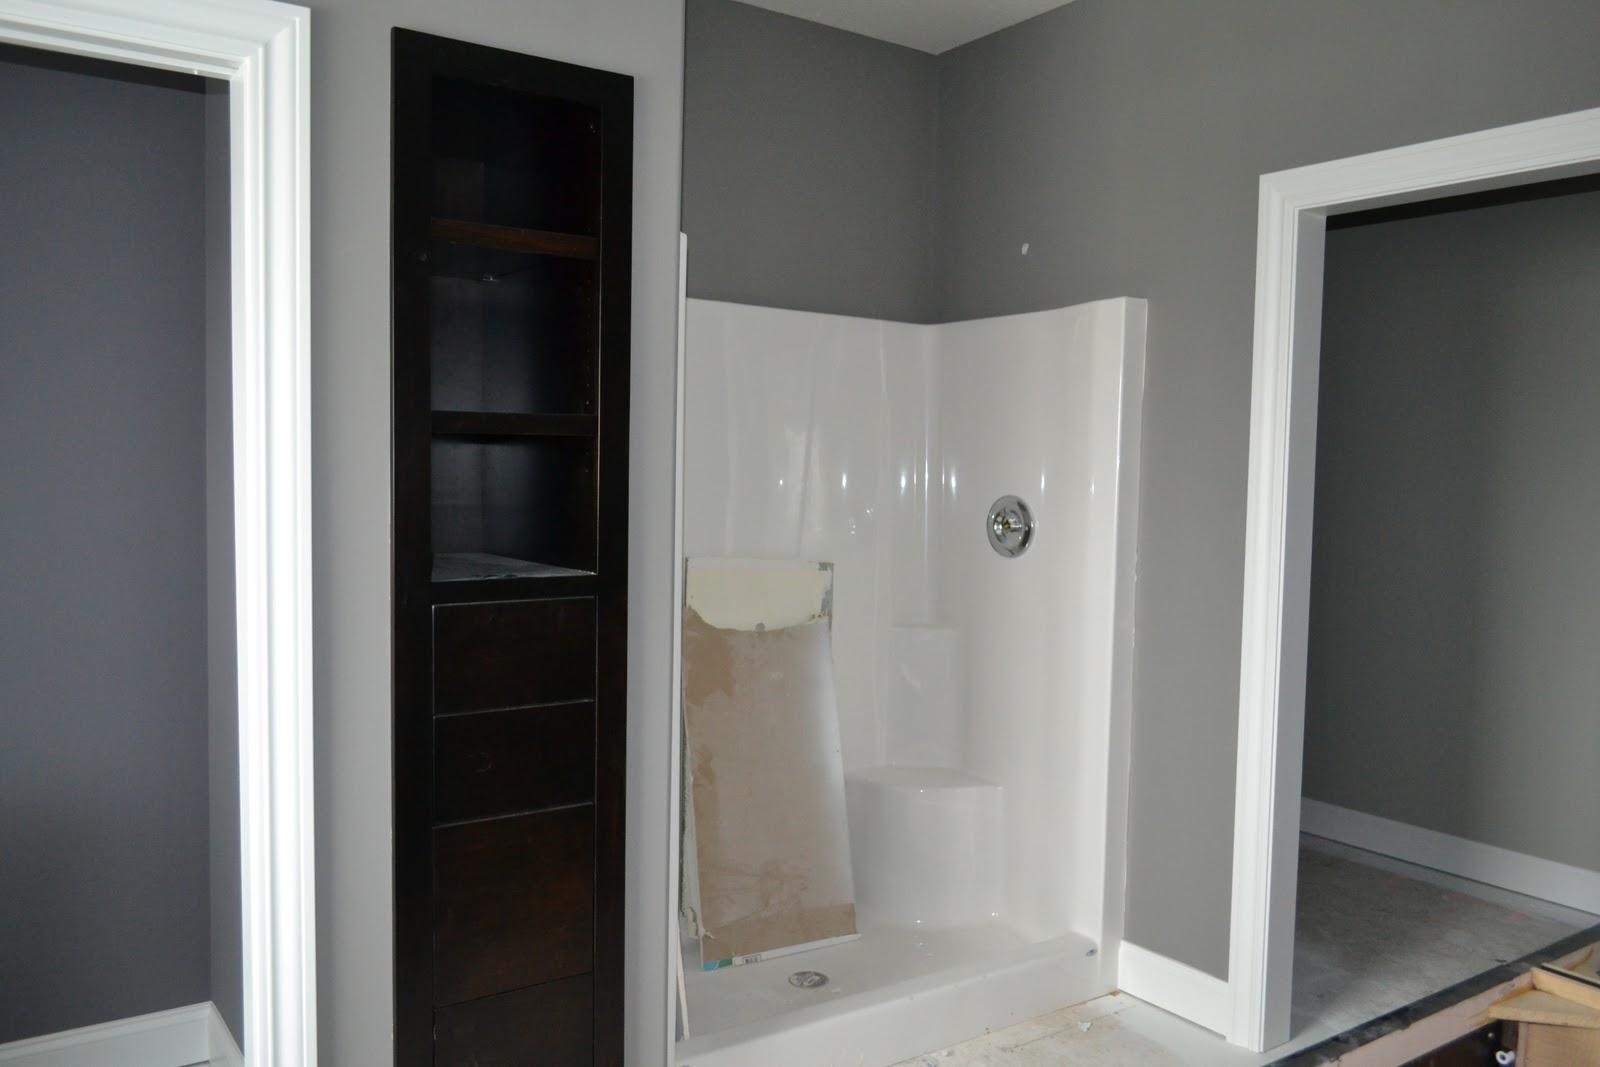 De jong dream house painting almost done for European steel enamel bathtub